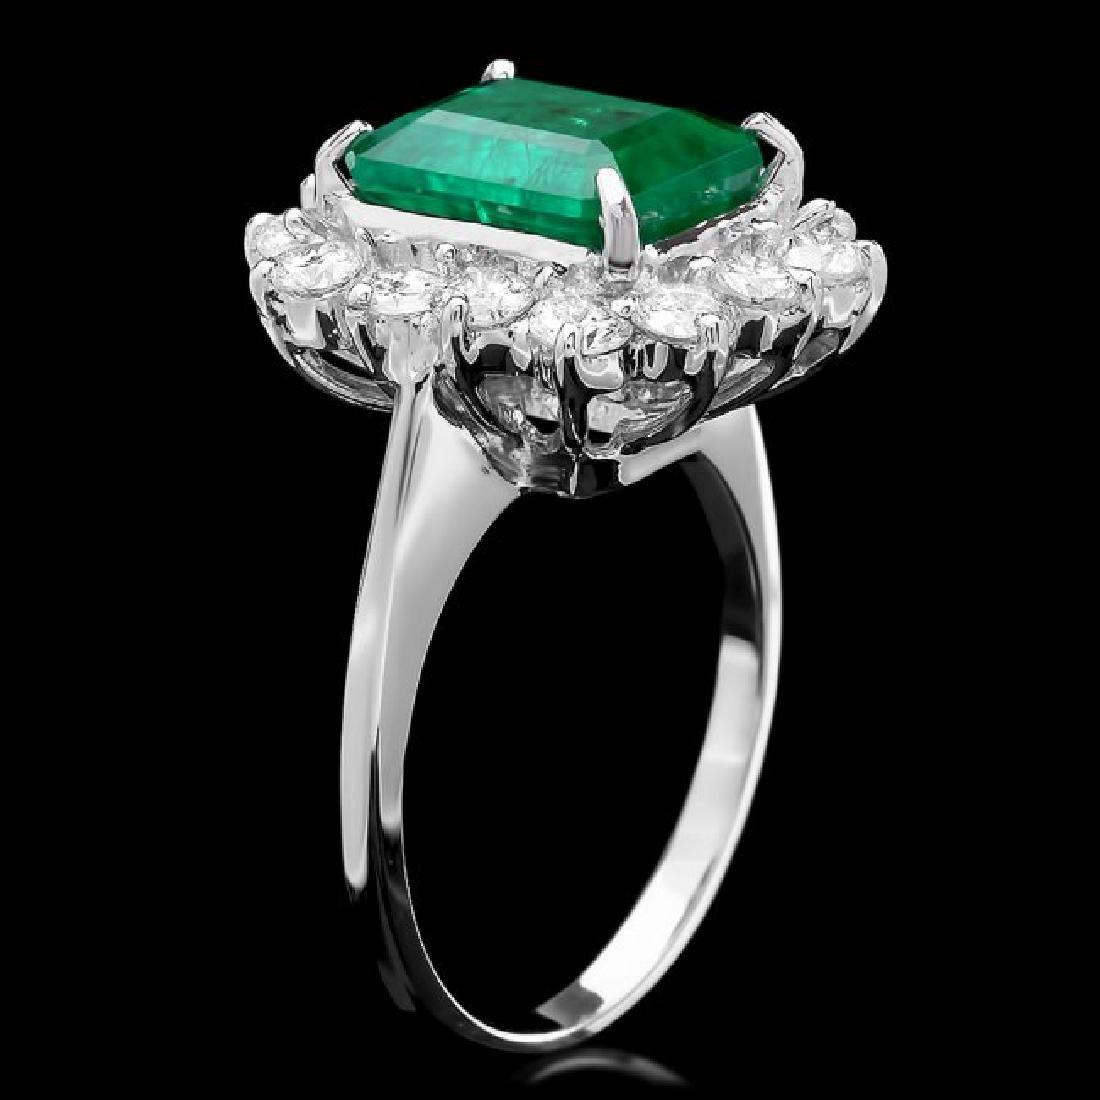 14k White Gold 3.13ct Emerald 1.35ct Diamond Ring - 2